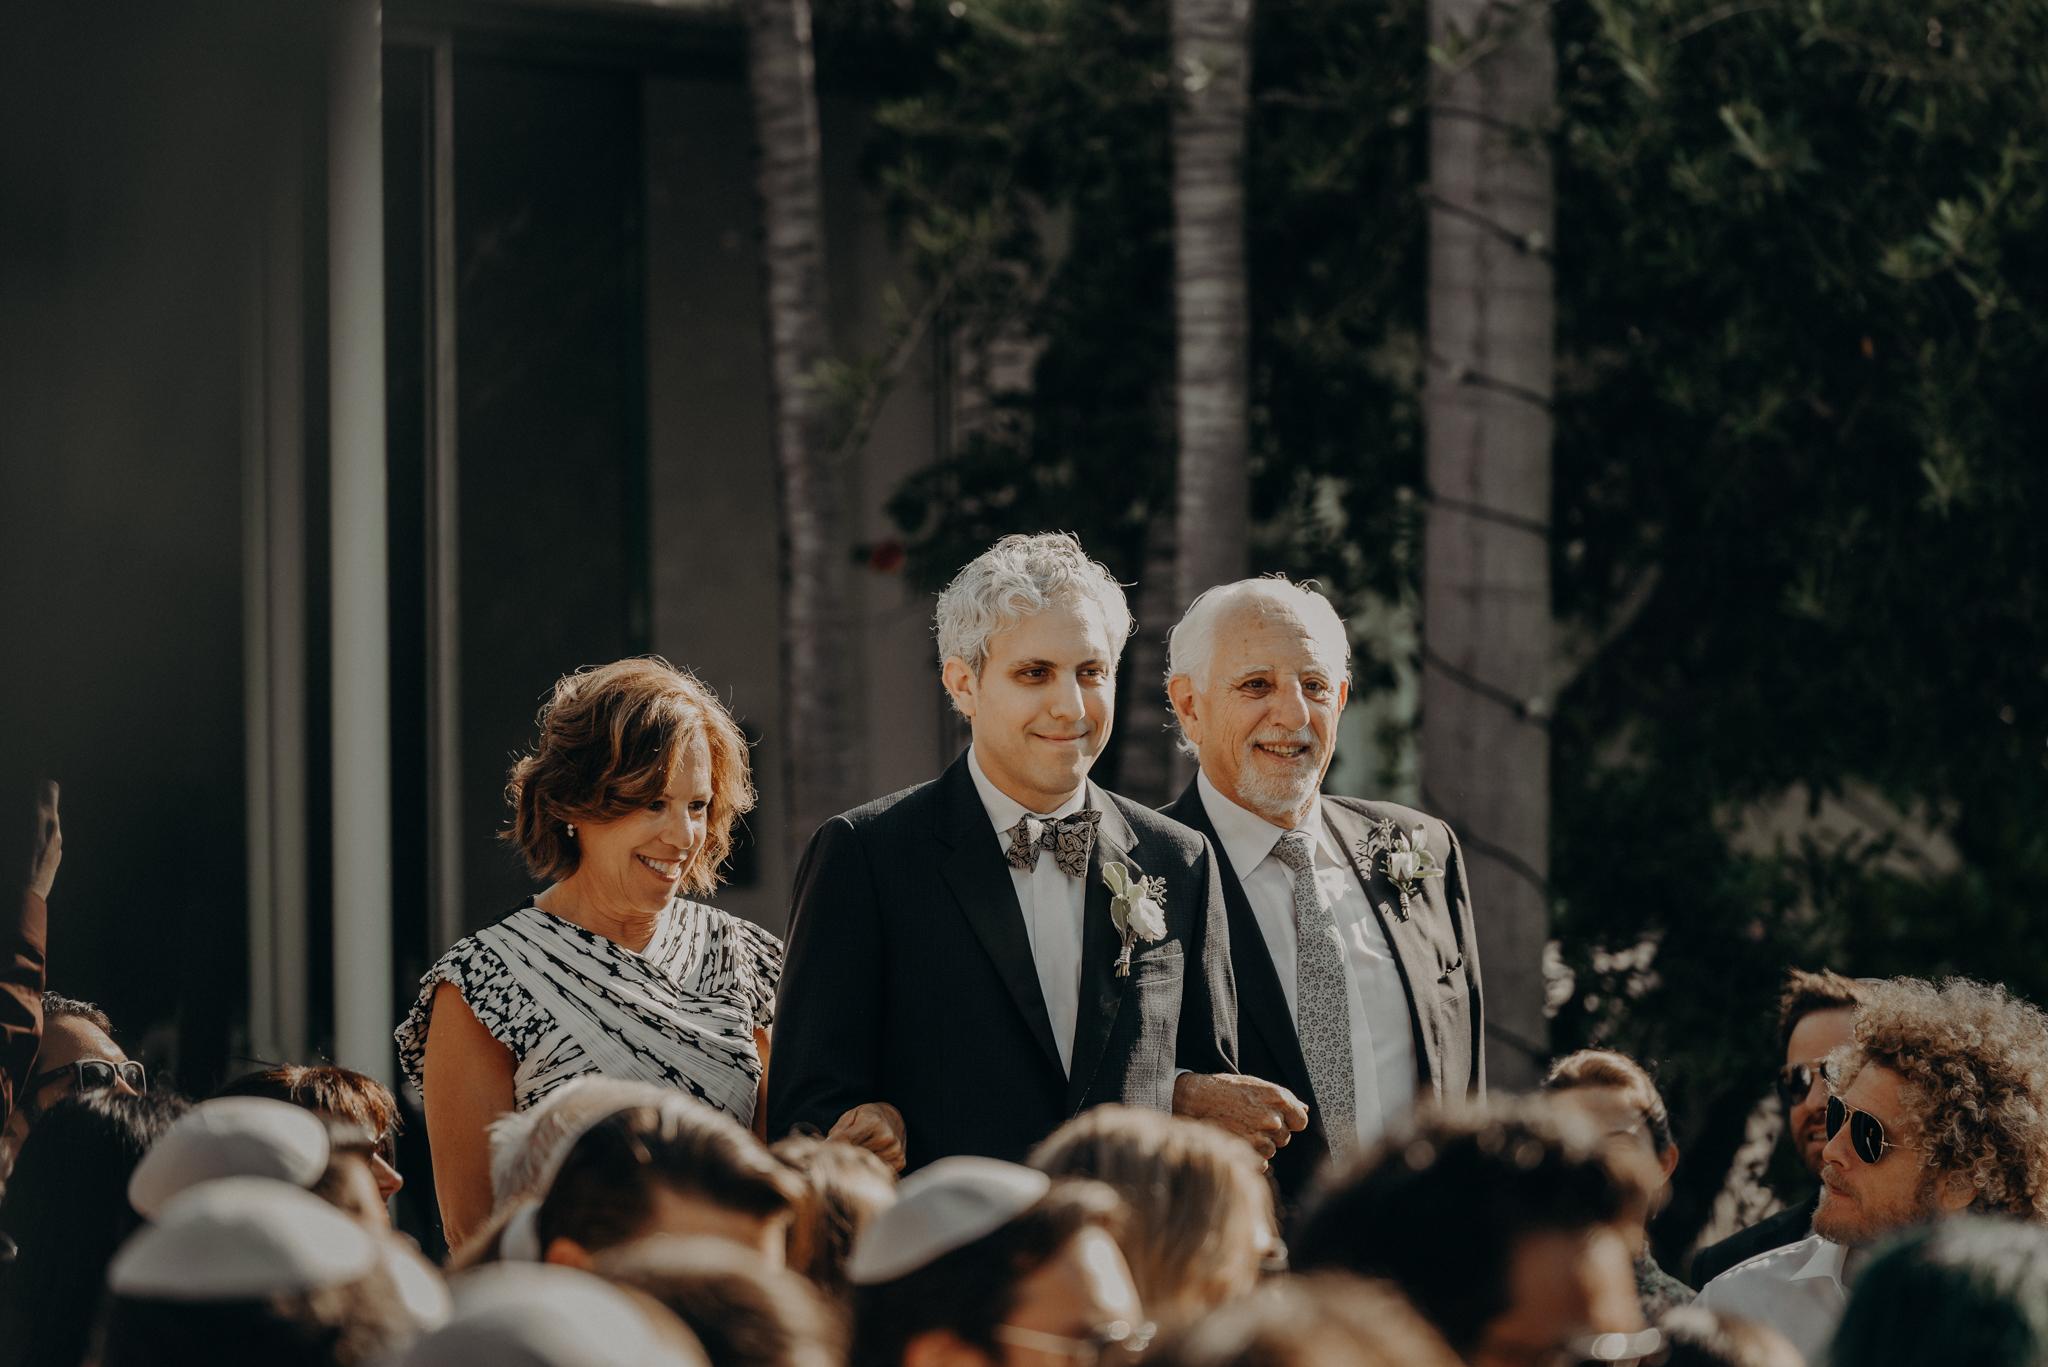 Isaiah + Taylor Photography - Private Estate Backyard Wedding - Beverly Hills - Los Angeles Wedding Photographer - 67.jpg